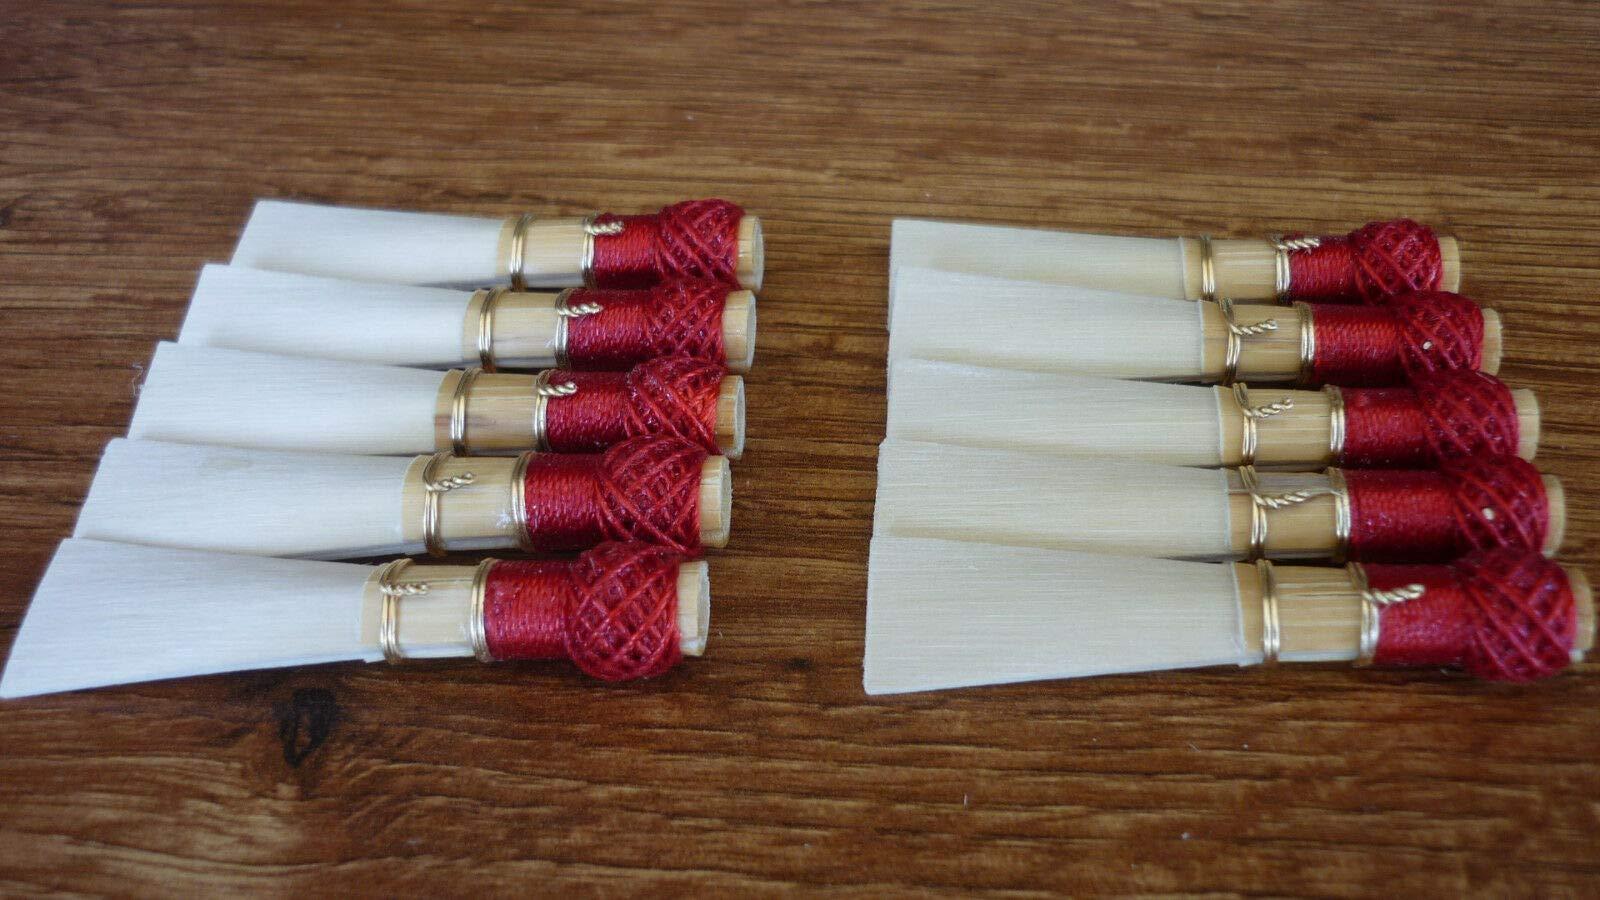 FidgetKute 10 Bassoon Reed Blanks from Marca Cane - Fox2 /dukov_Reeds MaF2 Show One Size by FidgetKute